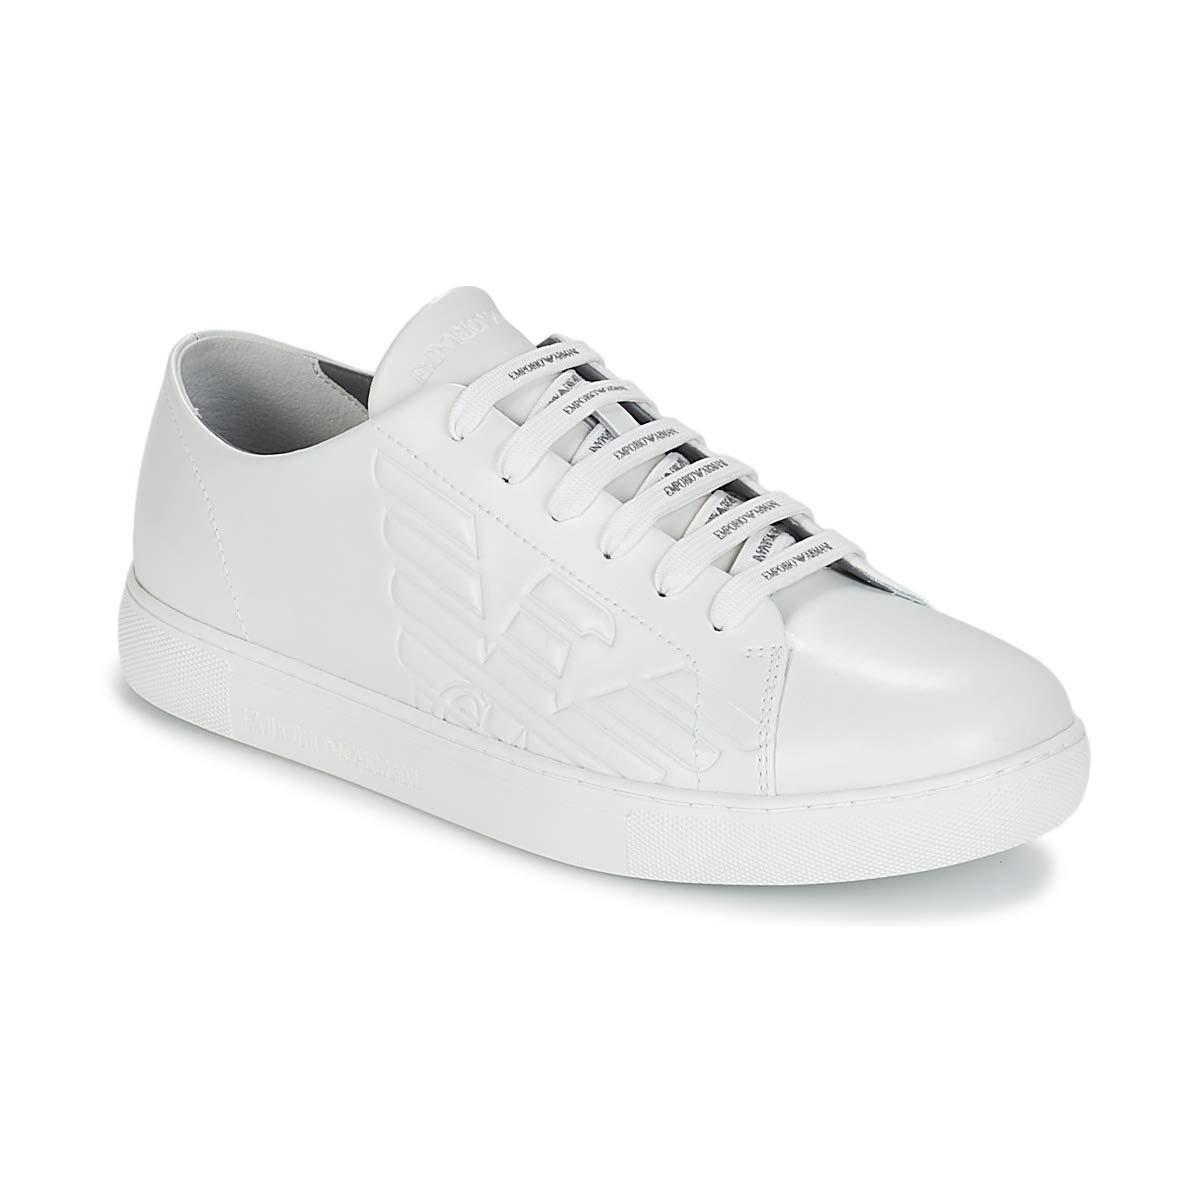 7428d3154 Amazon.com | Emporio Armani Side Logo Mens Shoes White | Fashion Sneakers